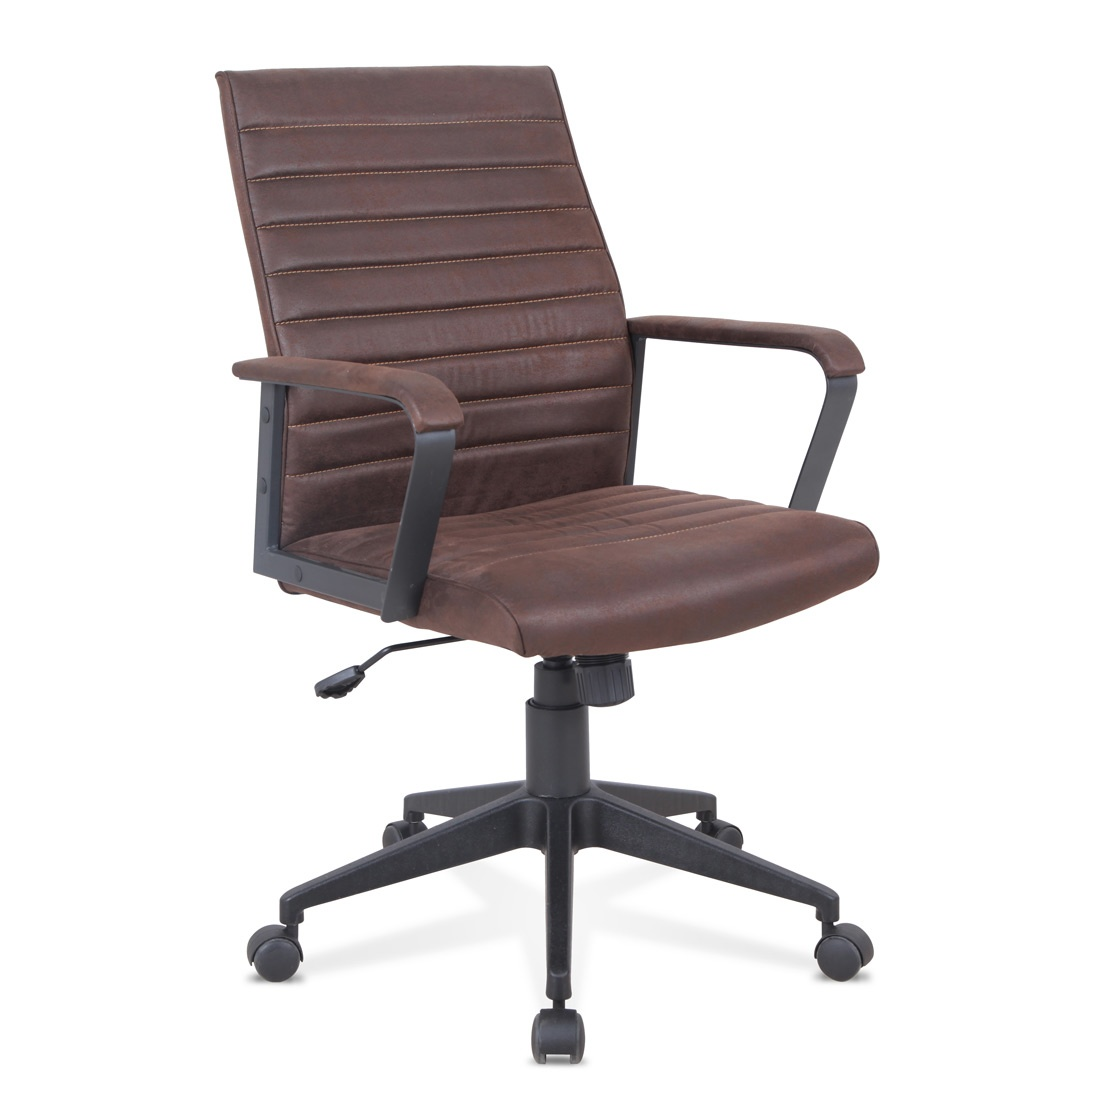 Silla ergonómica con cuero ecológico, resistente, para oficina ...